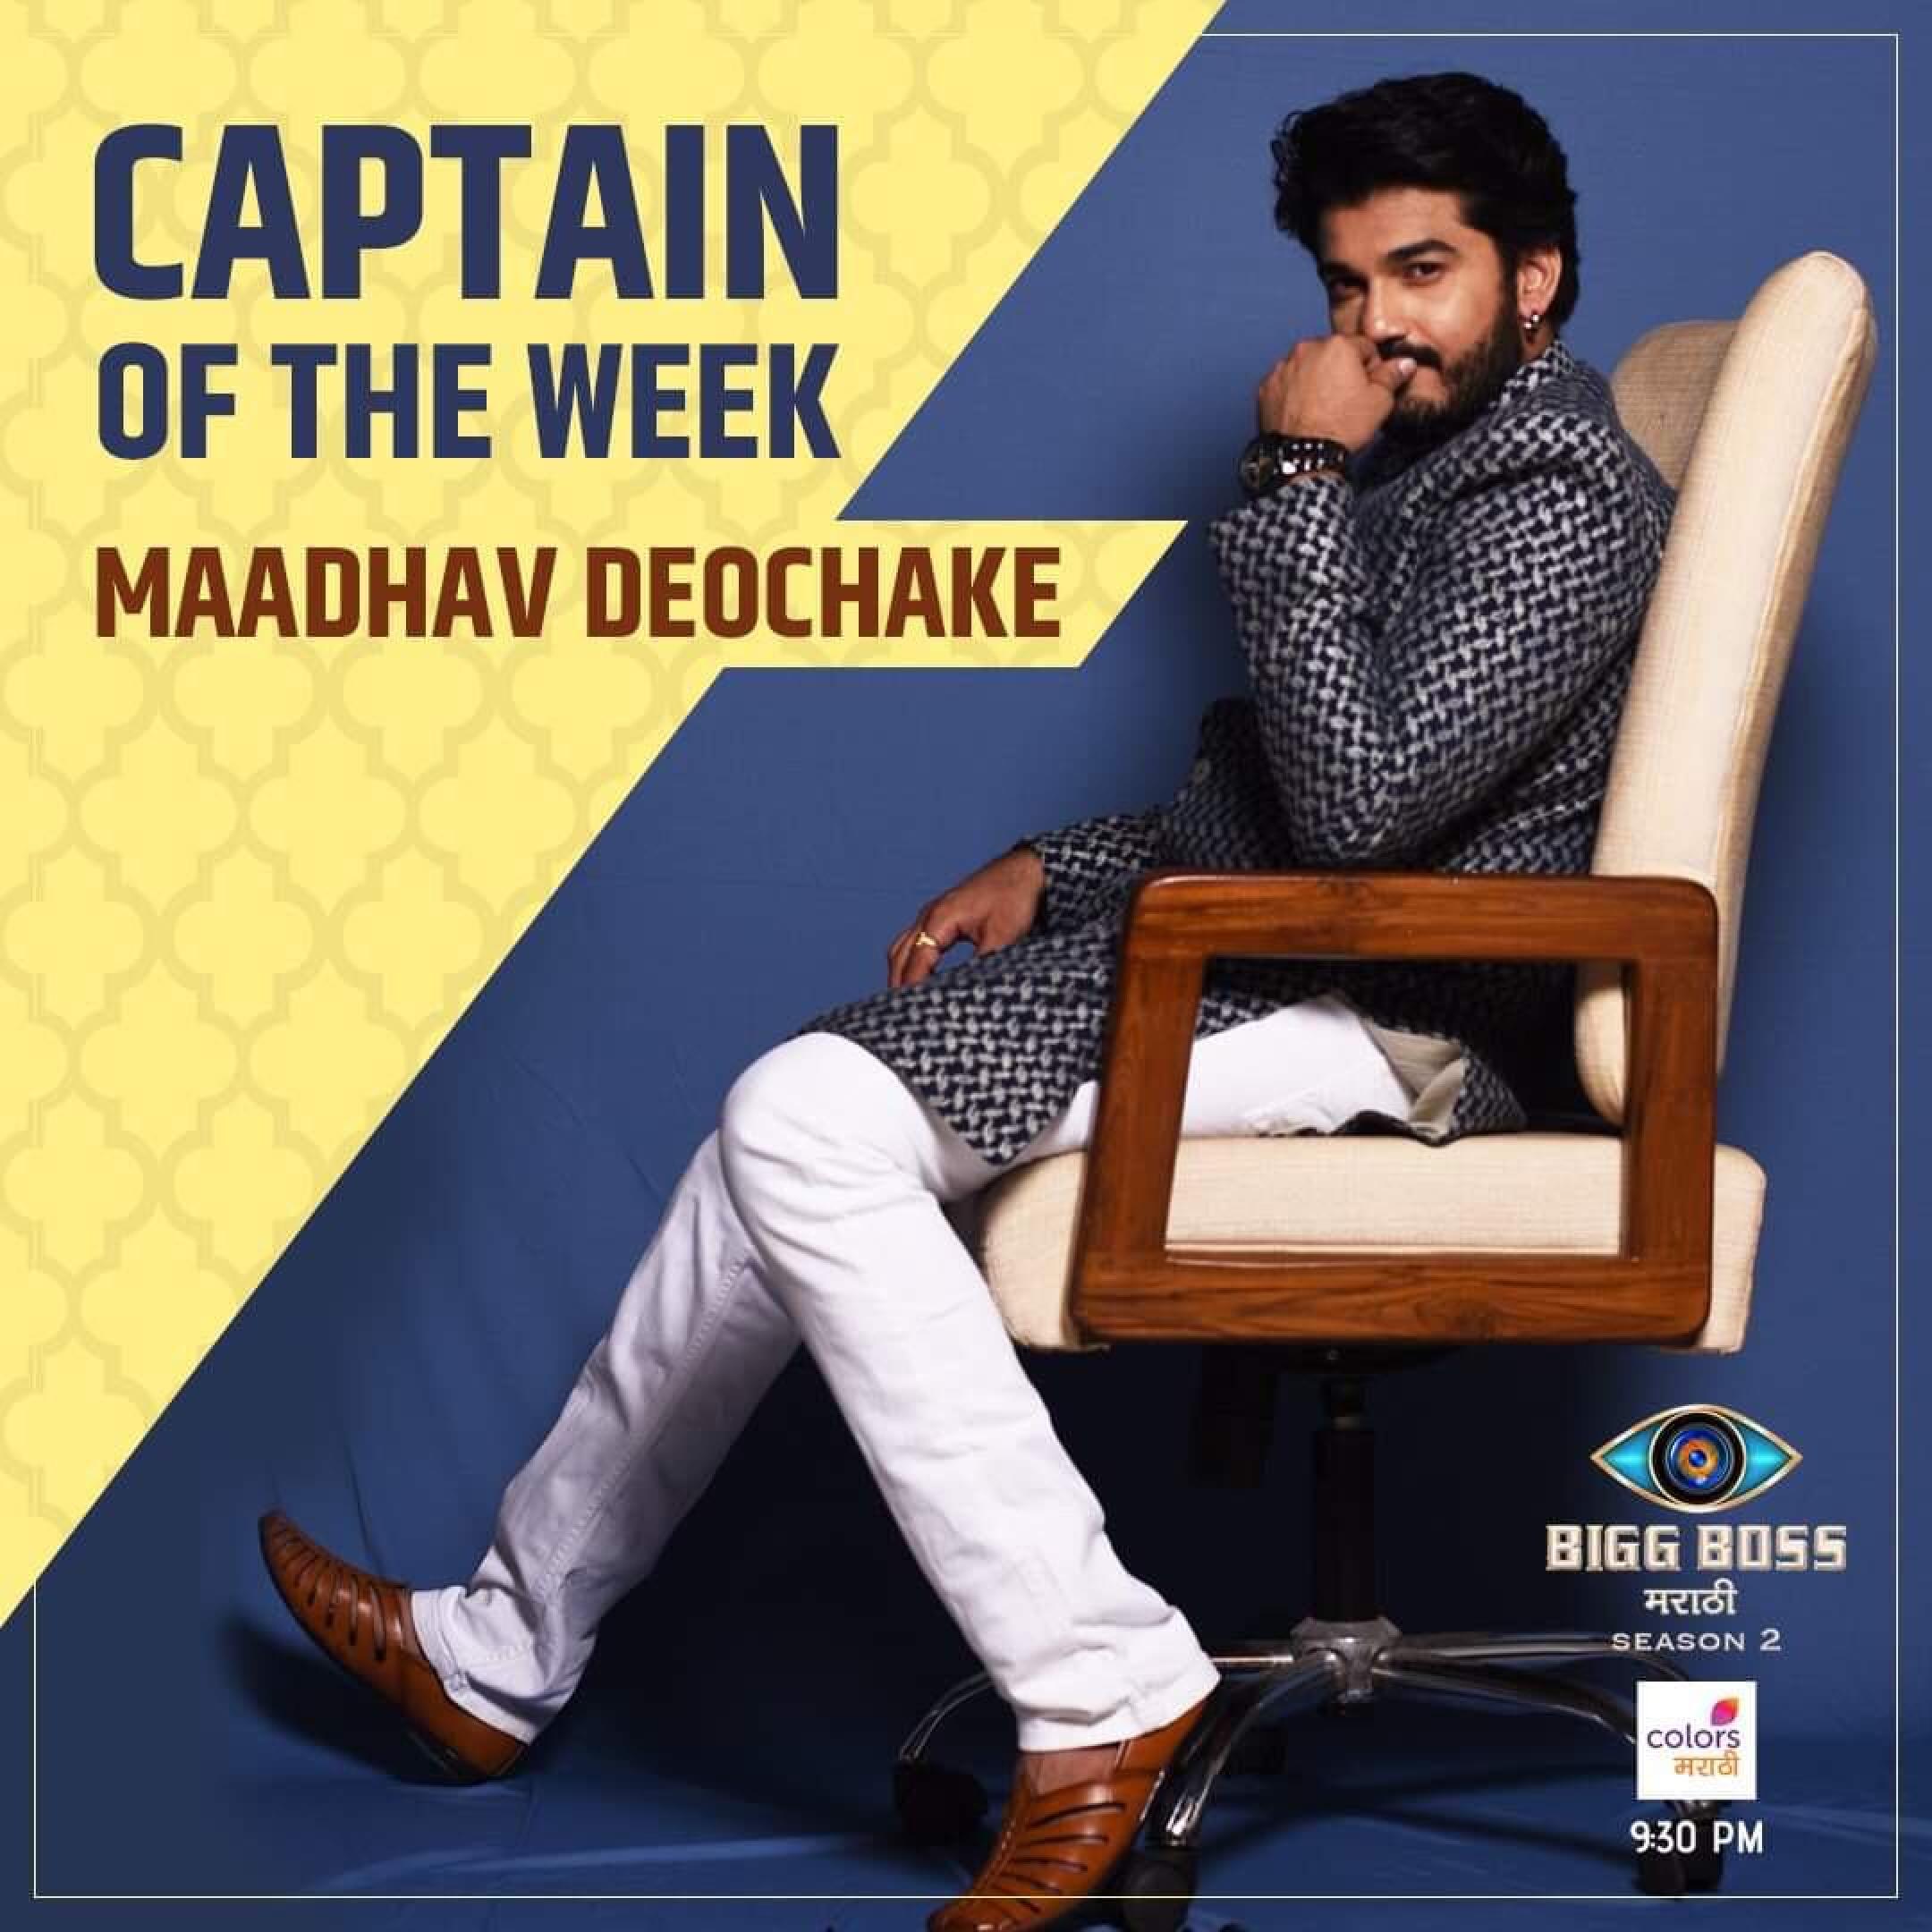 Maadhav Deochake becomes the captain of Bigg Boss Marathi house